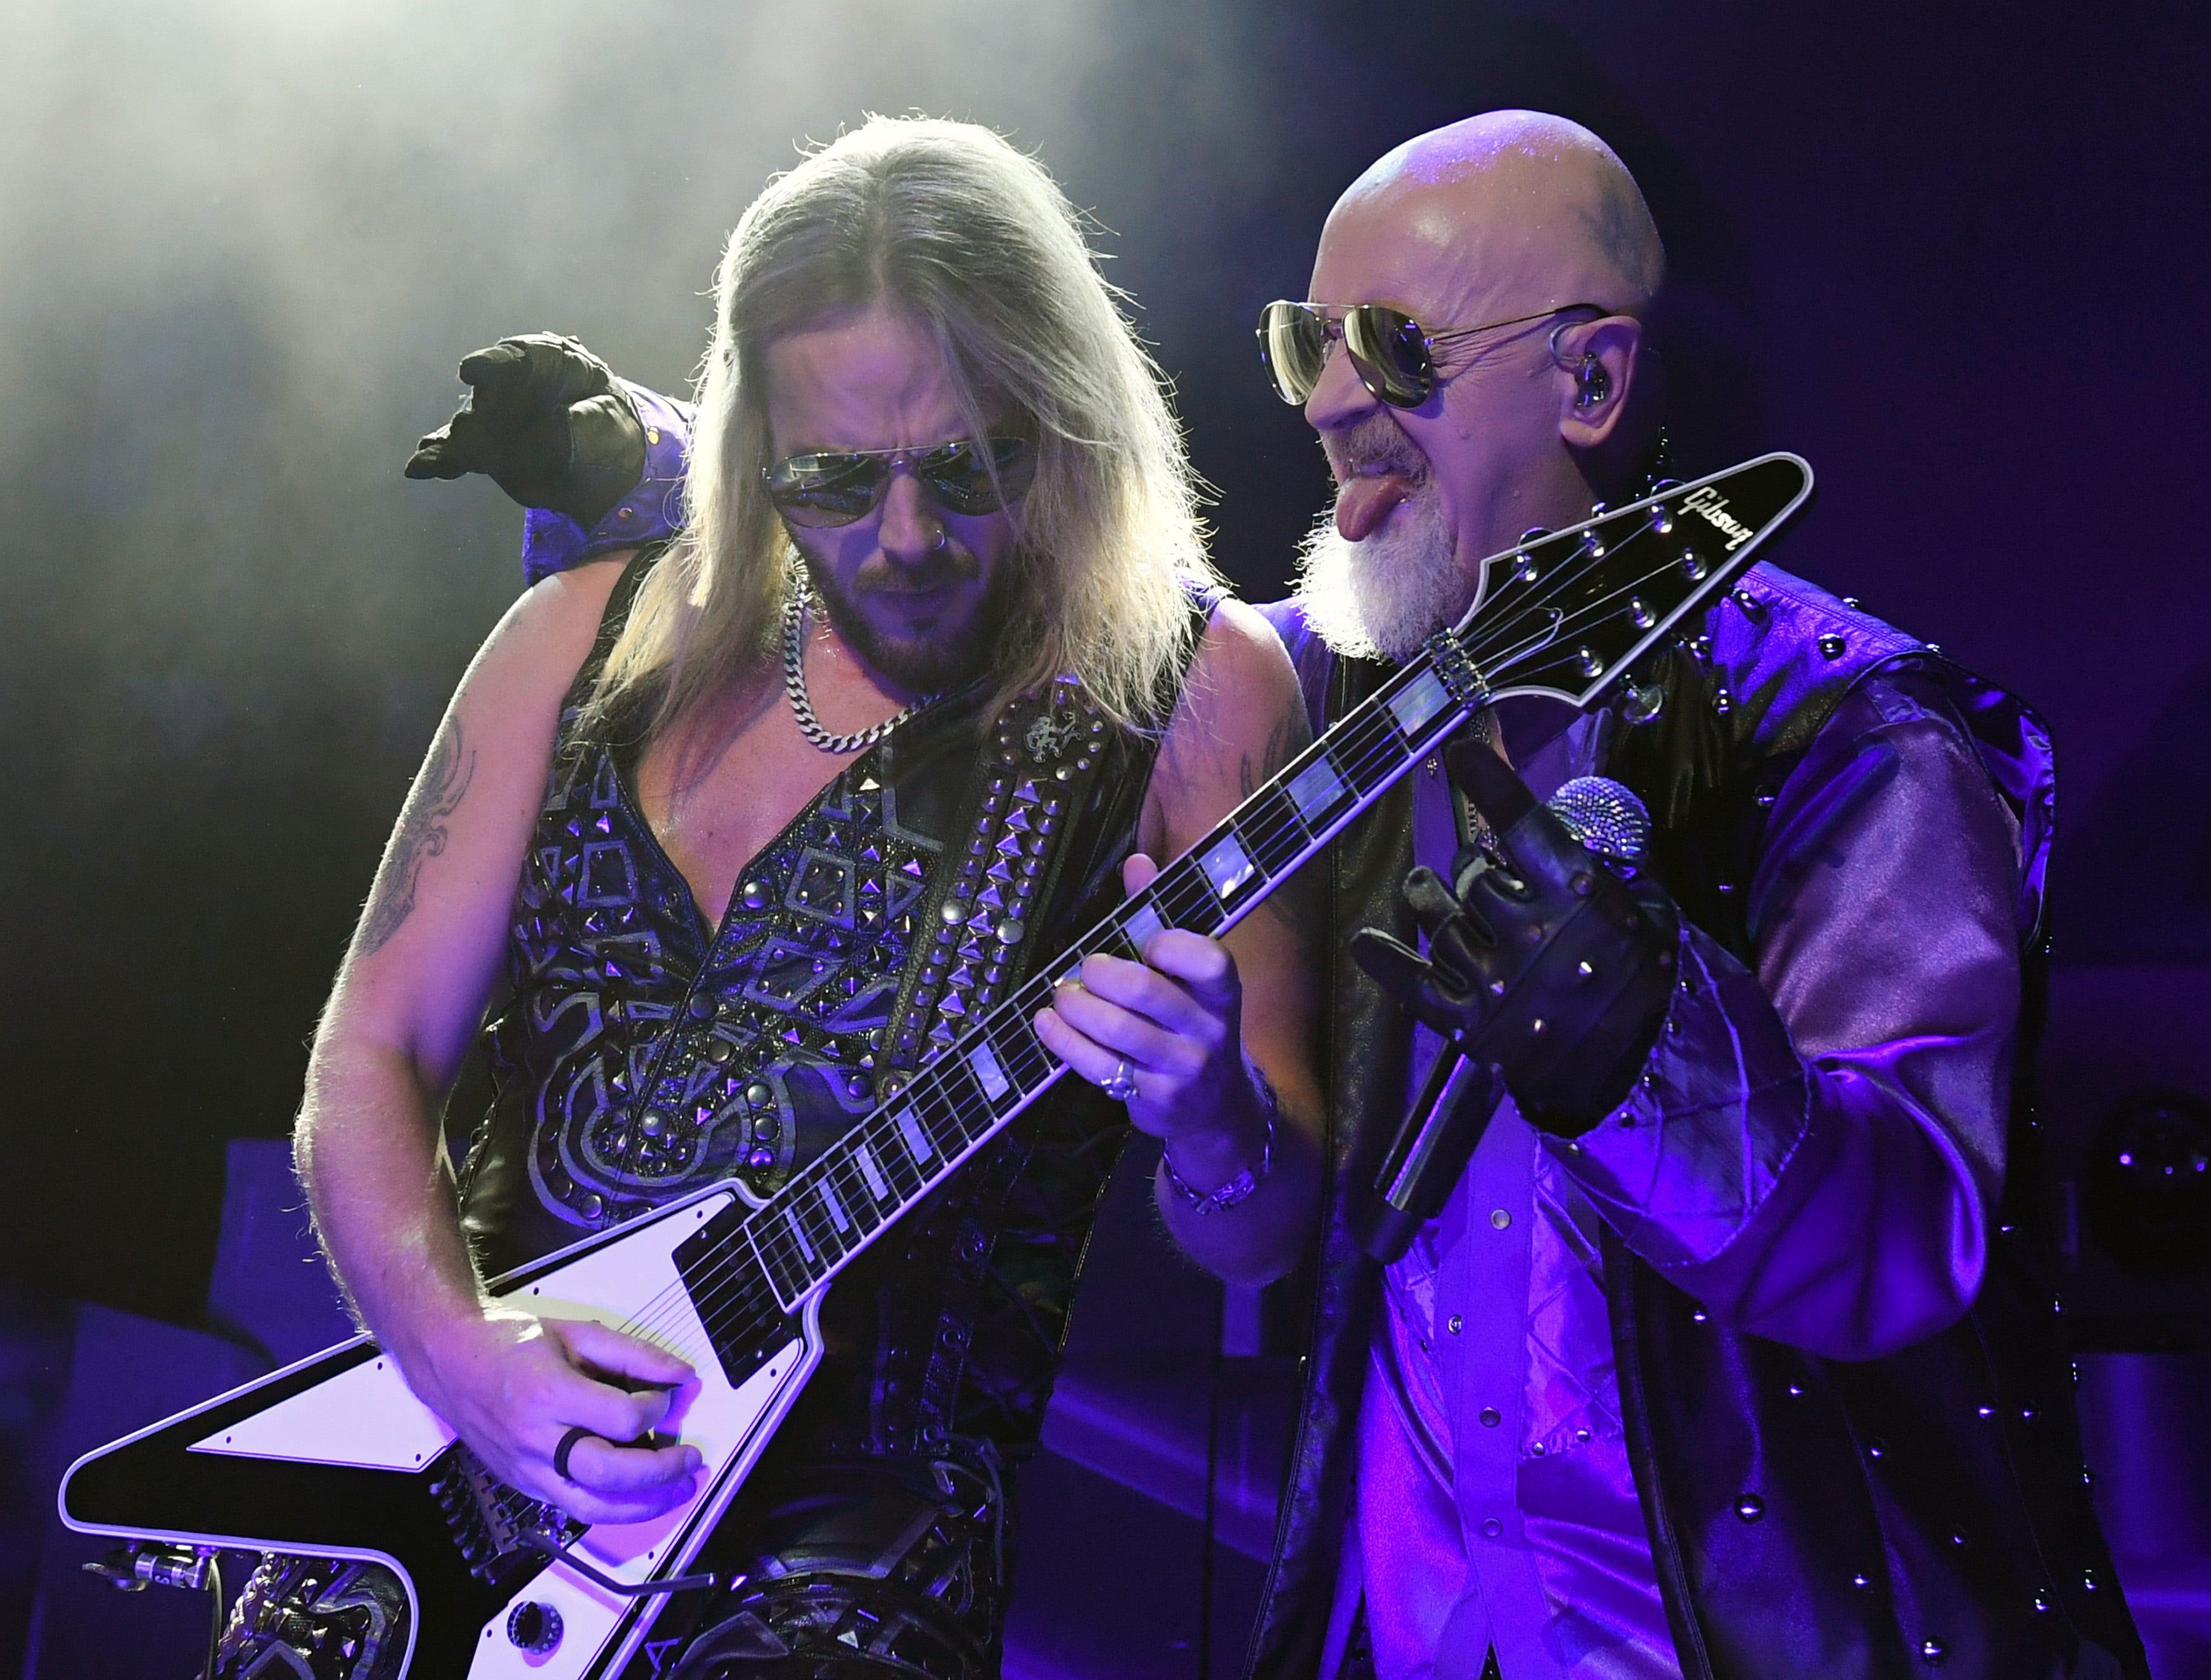 Judas Priest s Ian Hill talks  50 Heavy Metal Years  ahead of Louder Than Life performance